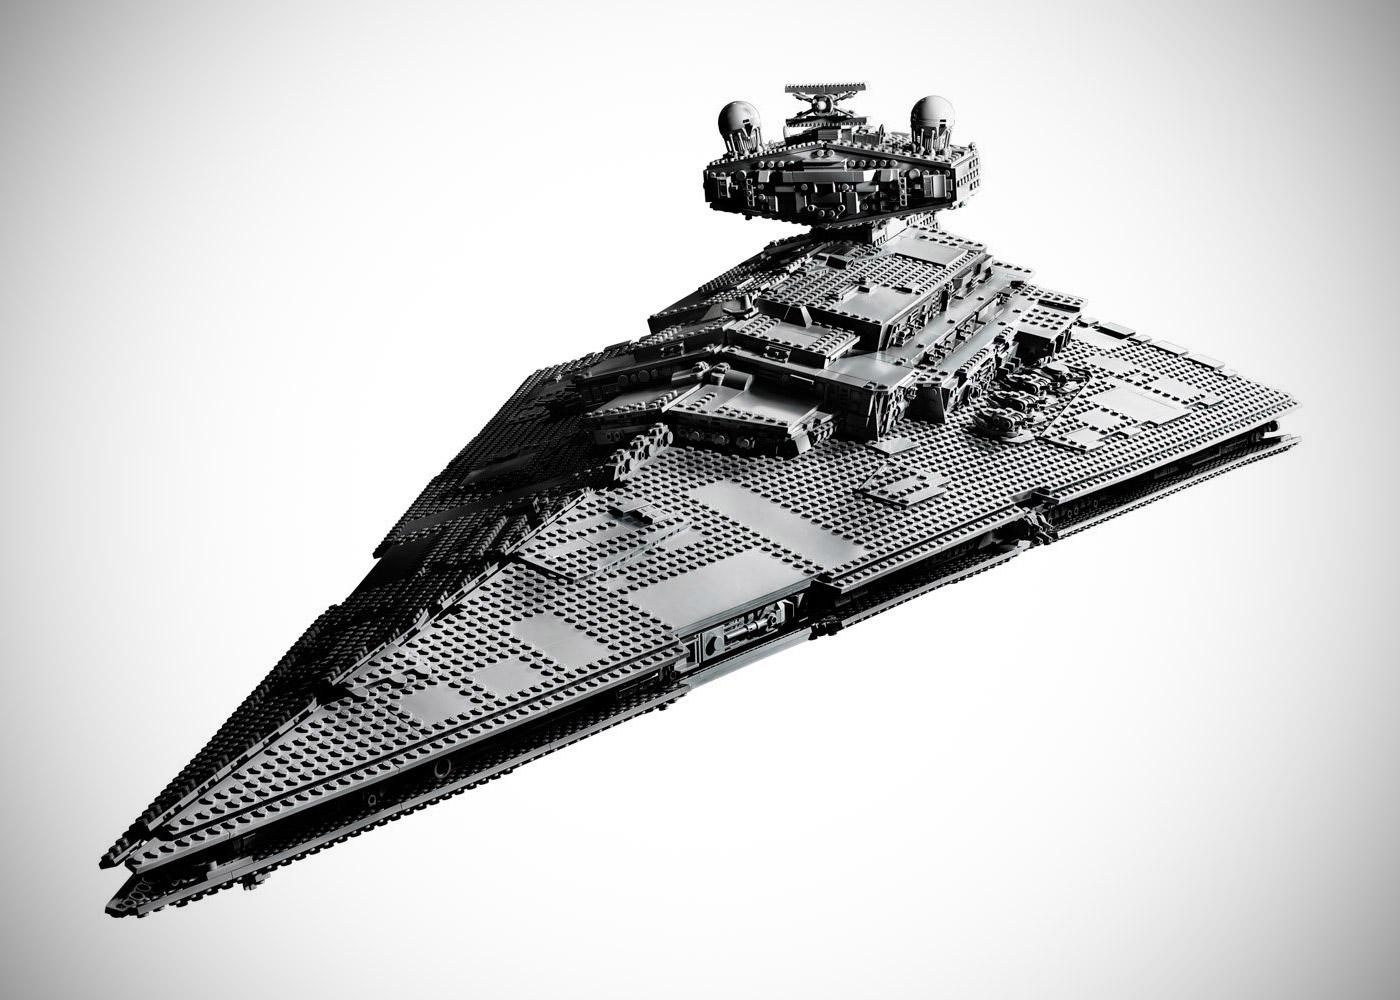 LEGO Ultimate Imperial Star Destroyer